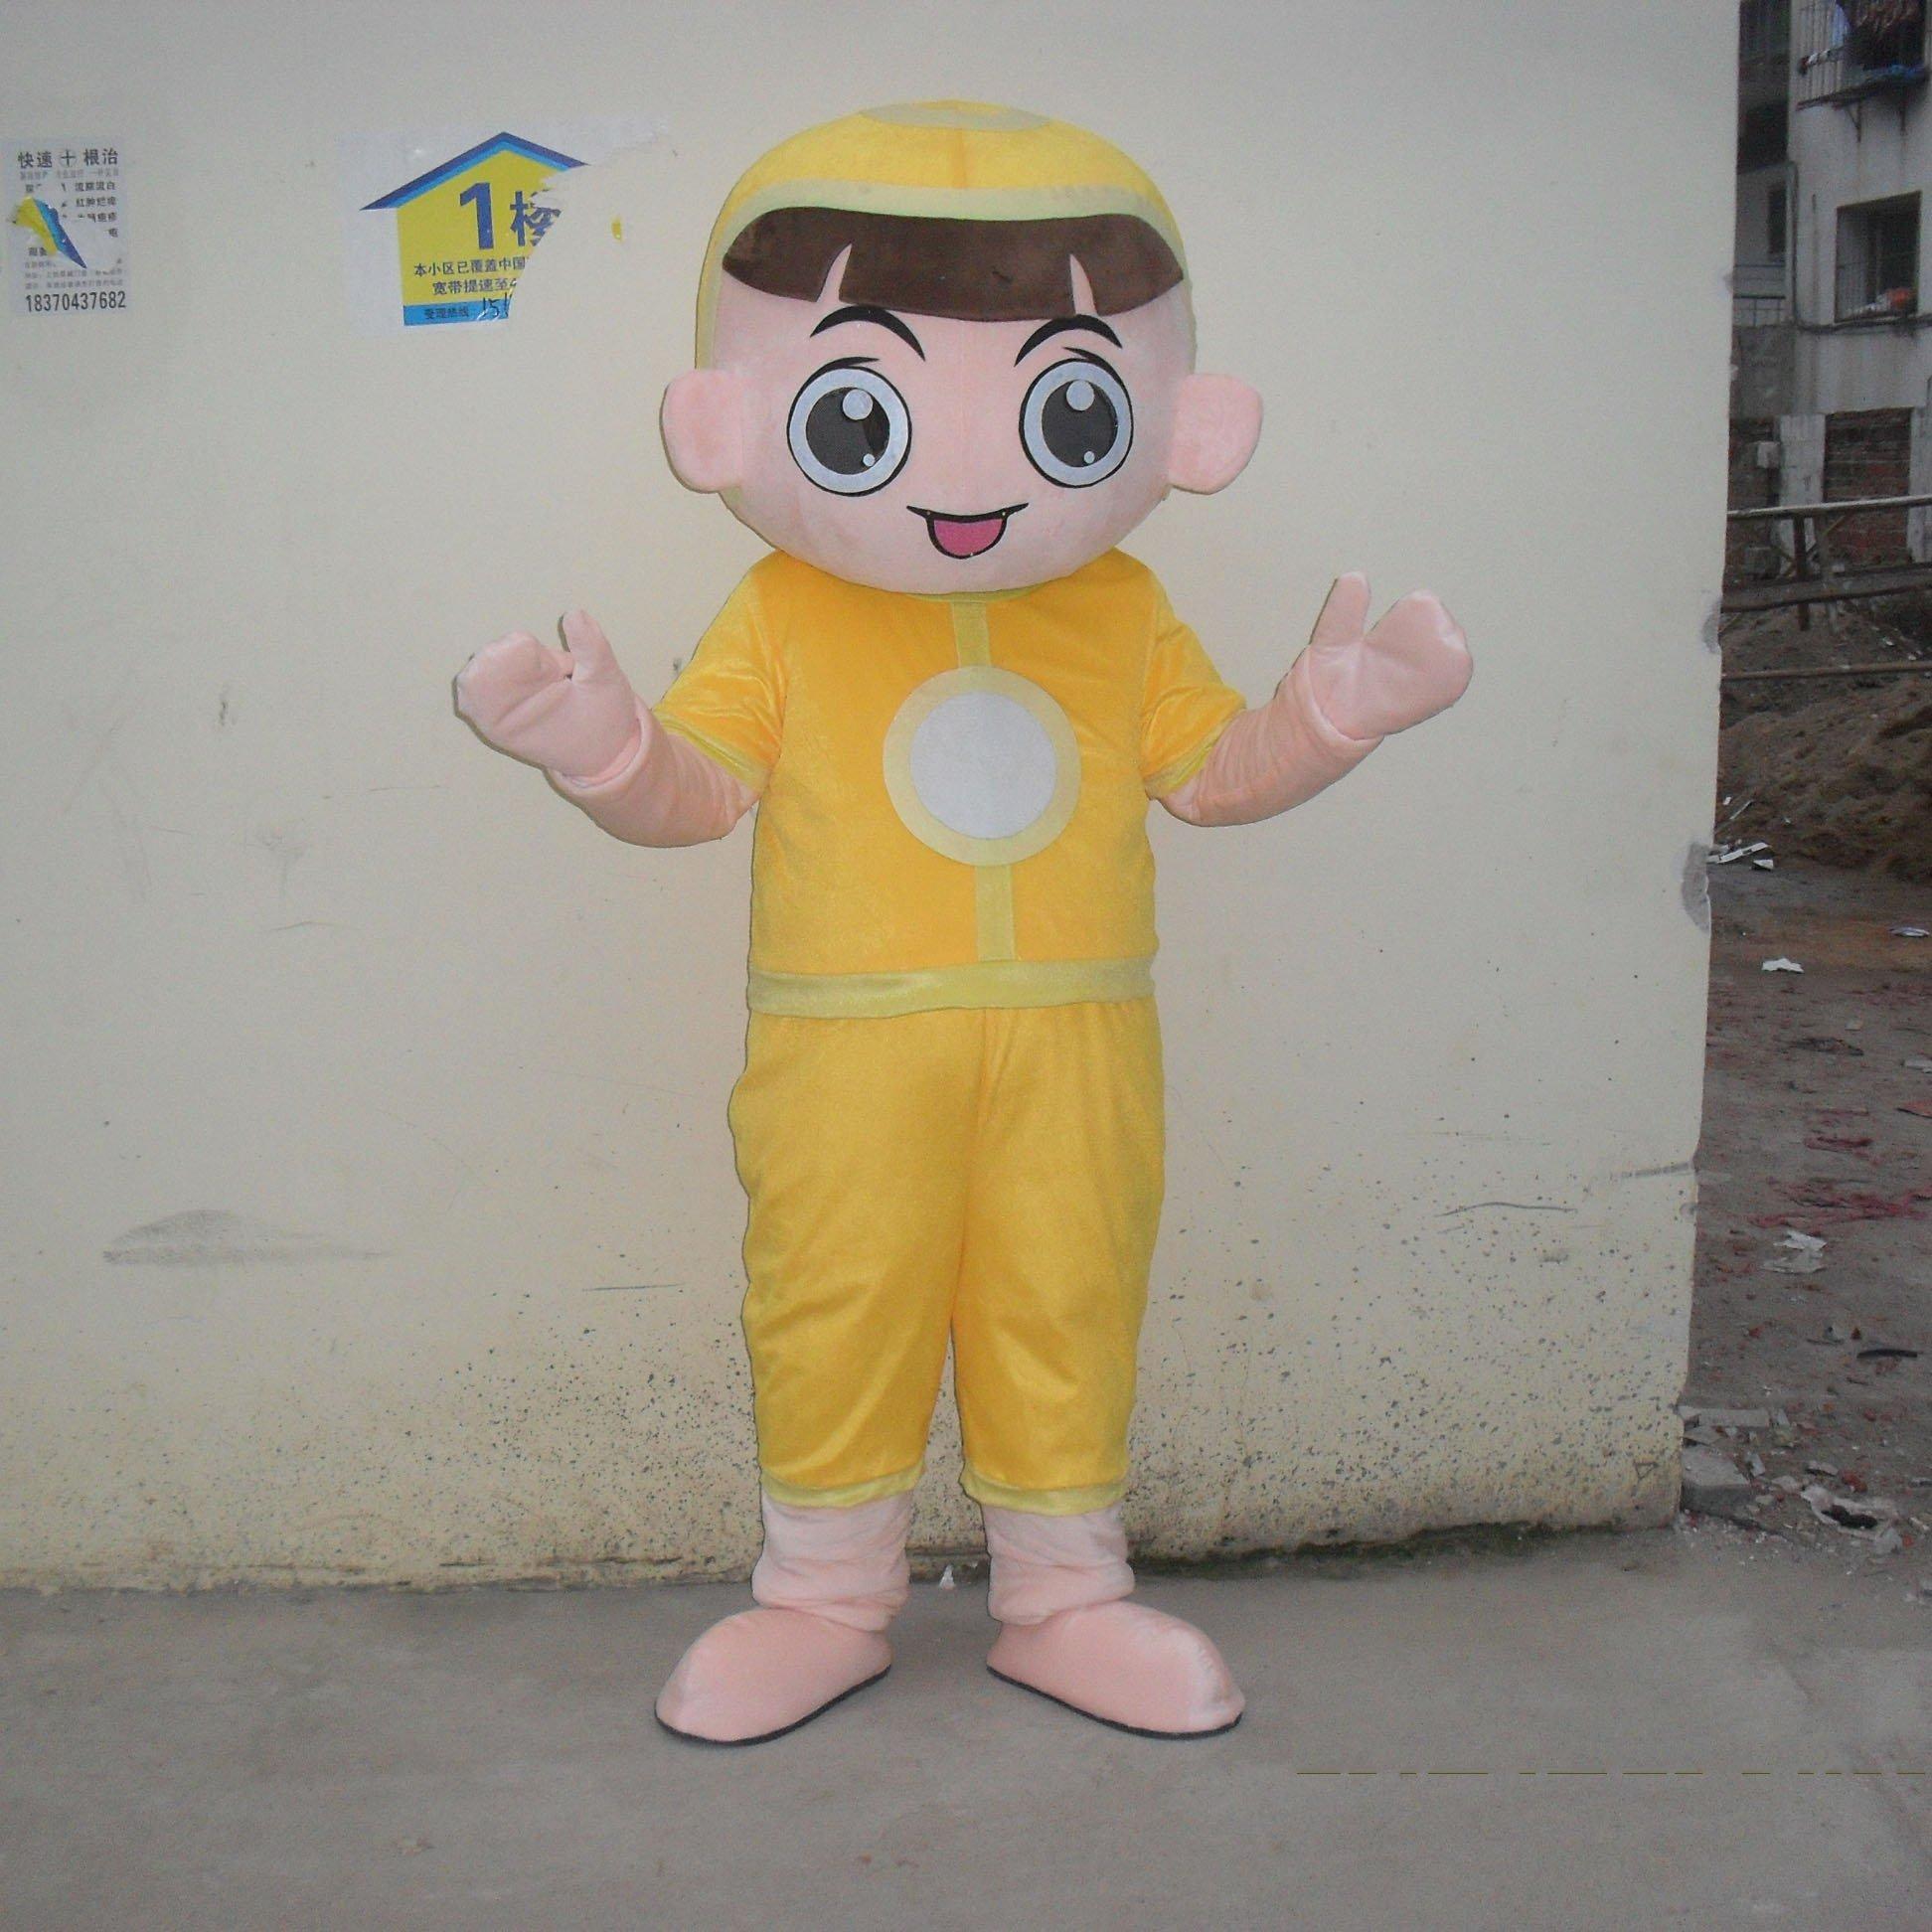 Cartoon Doll Clothing Cartoon Walking Doll Clothing Cartoon Show Clothing Plush Dolls Doll Clothing Snake Mascot Costume